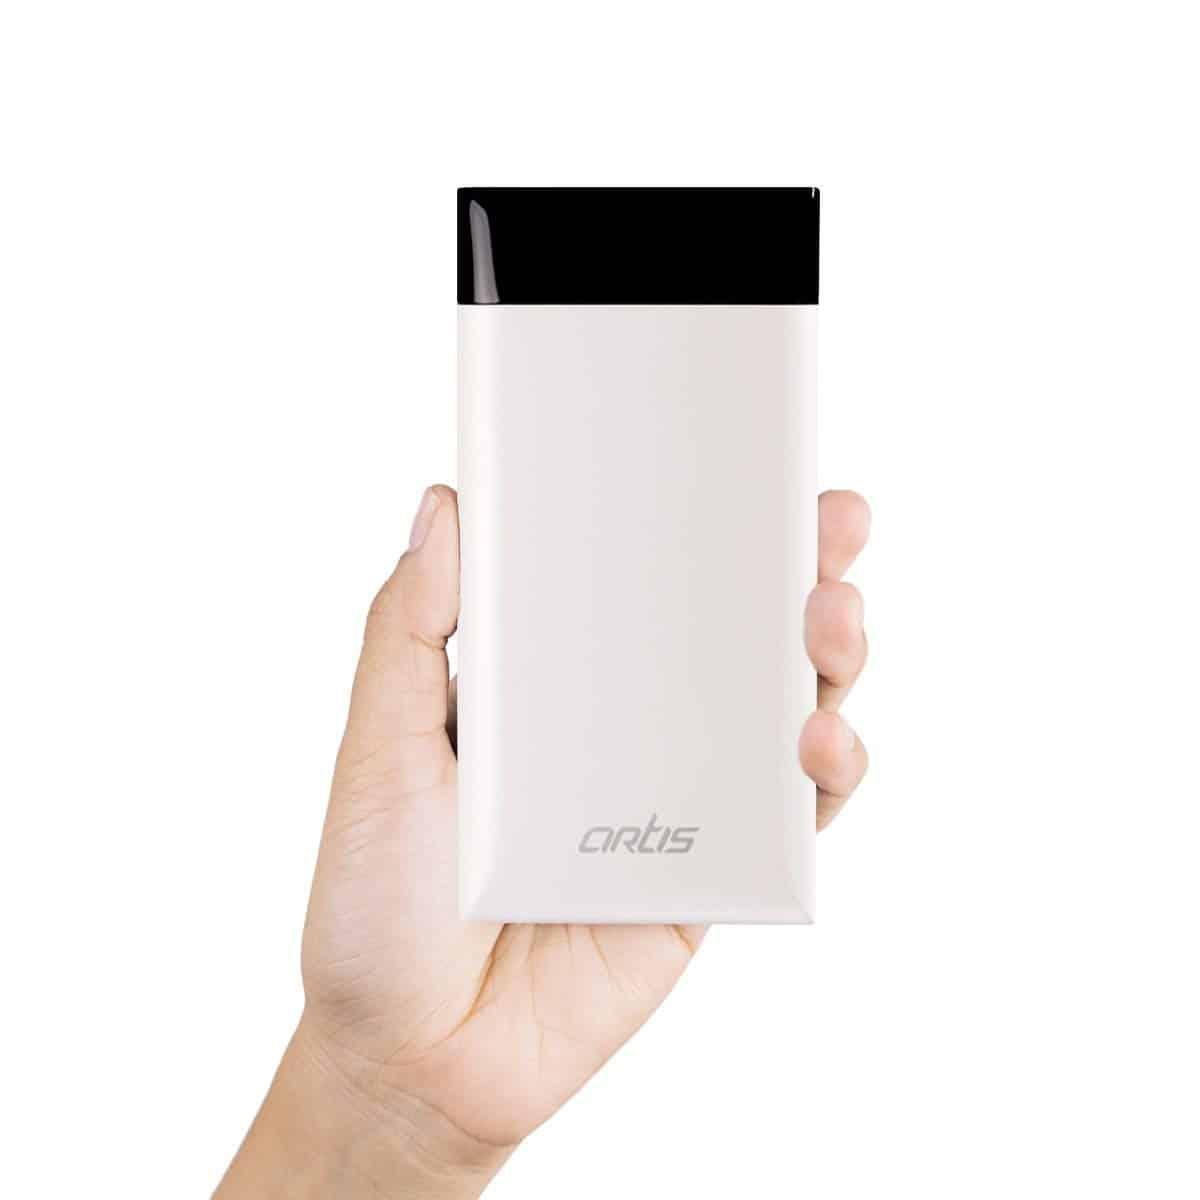 Artis AR-PB15000 15000mAH Lithium Polymer Slim Power Bank (White)